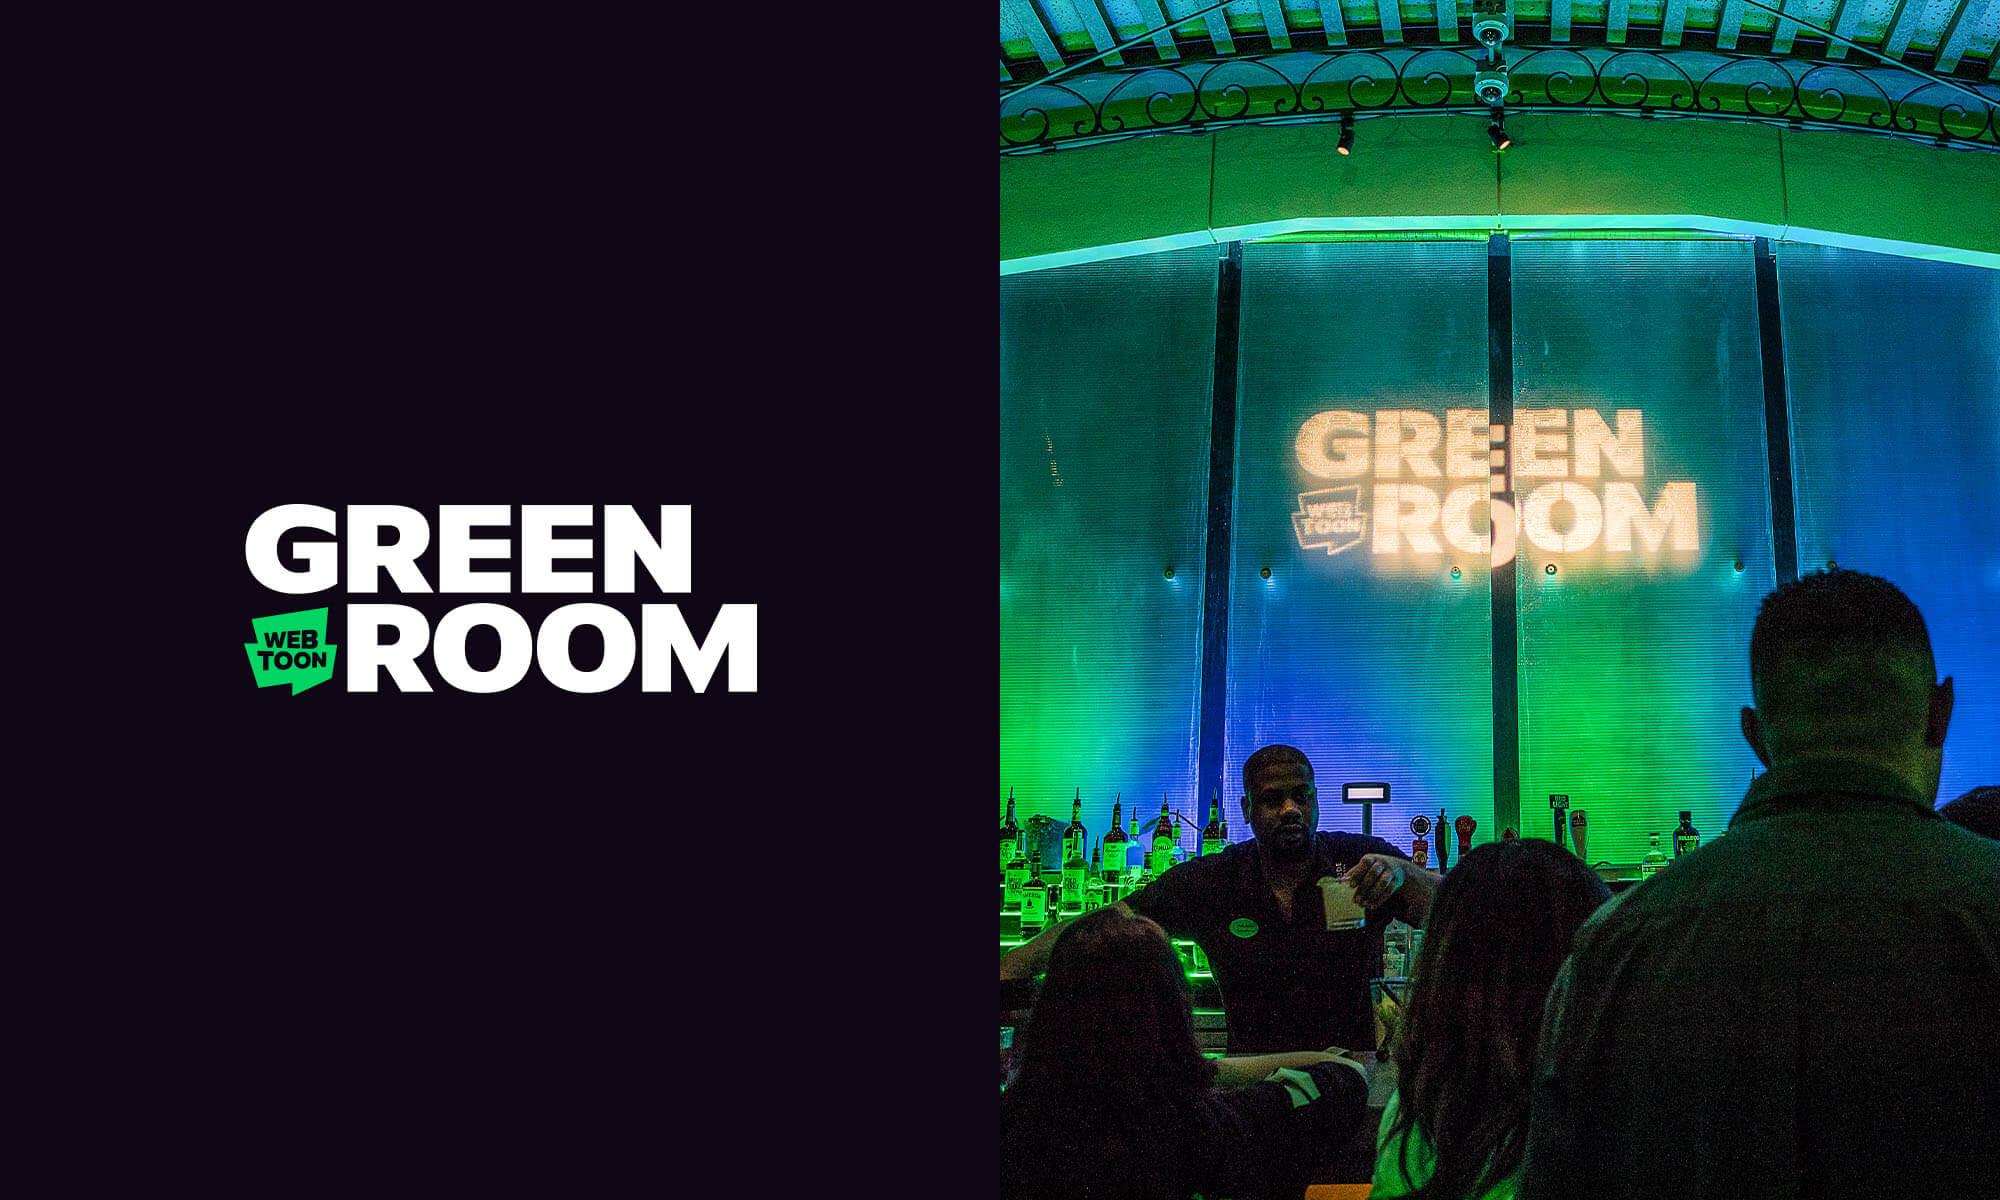 studio-malagon-green-room-brand-01.jpg